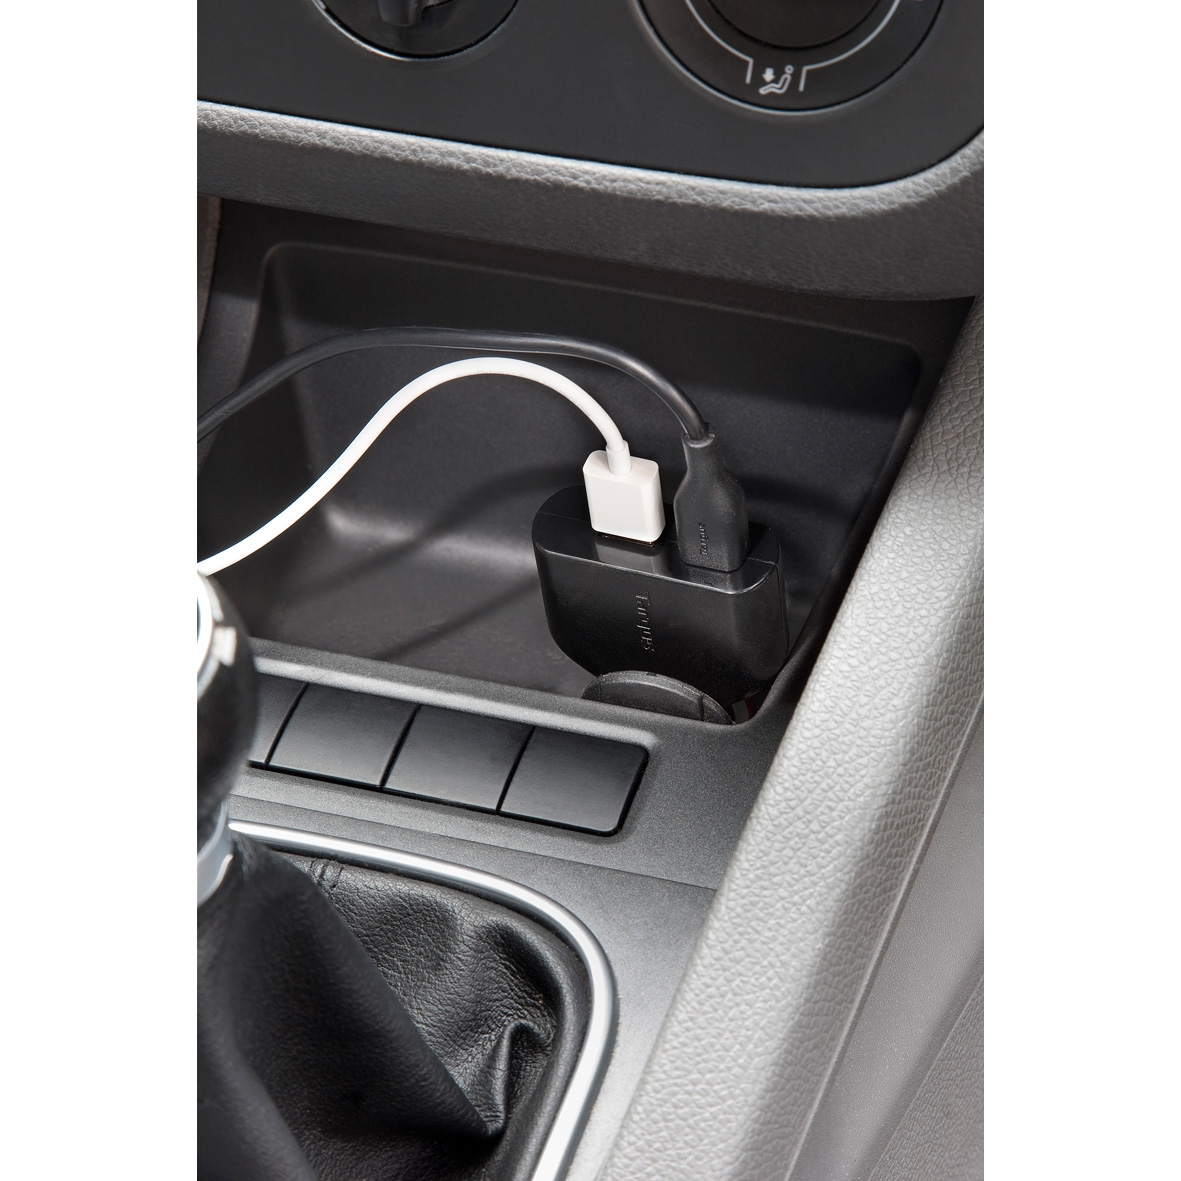 targus laptop car charger review